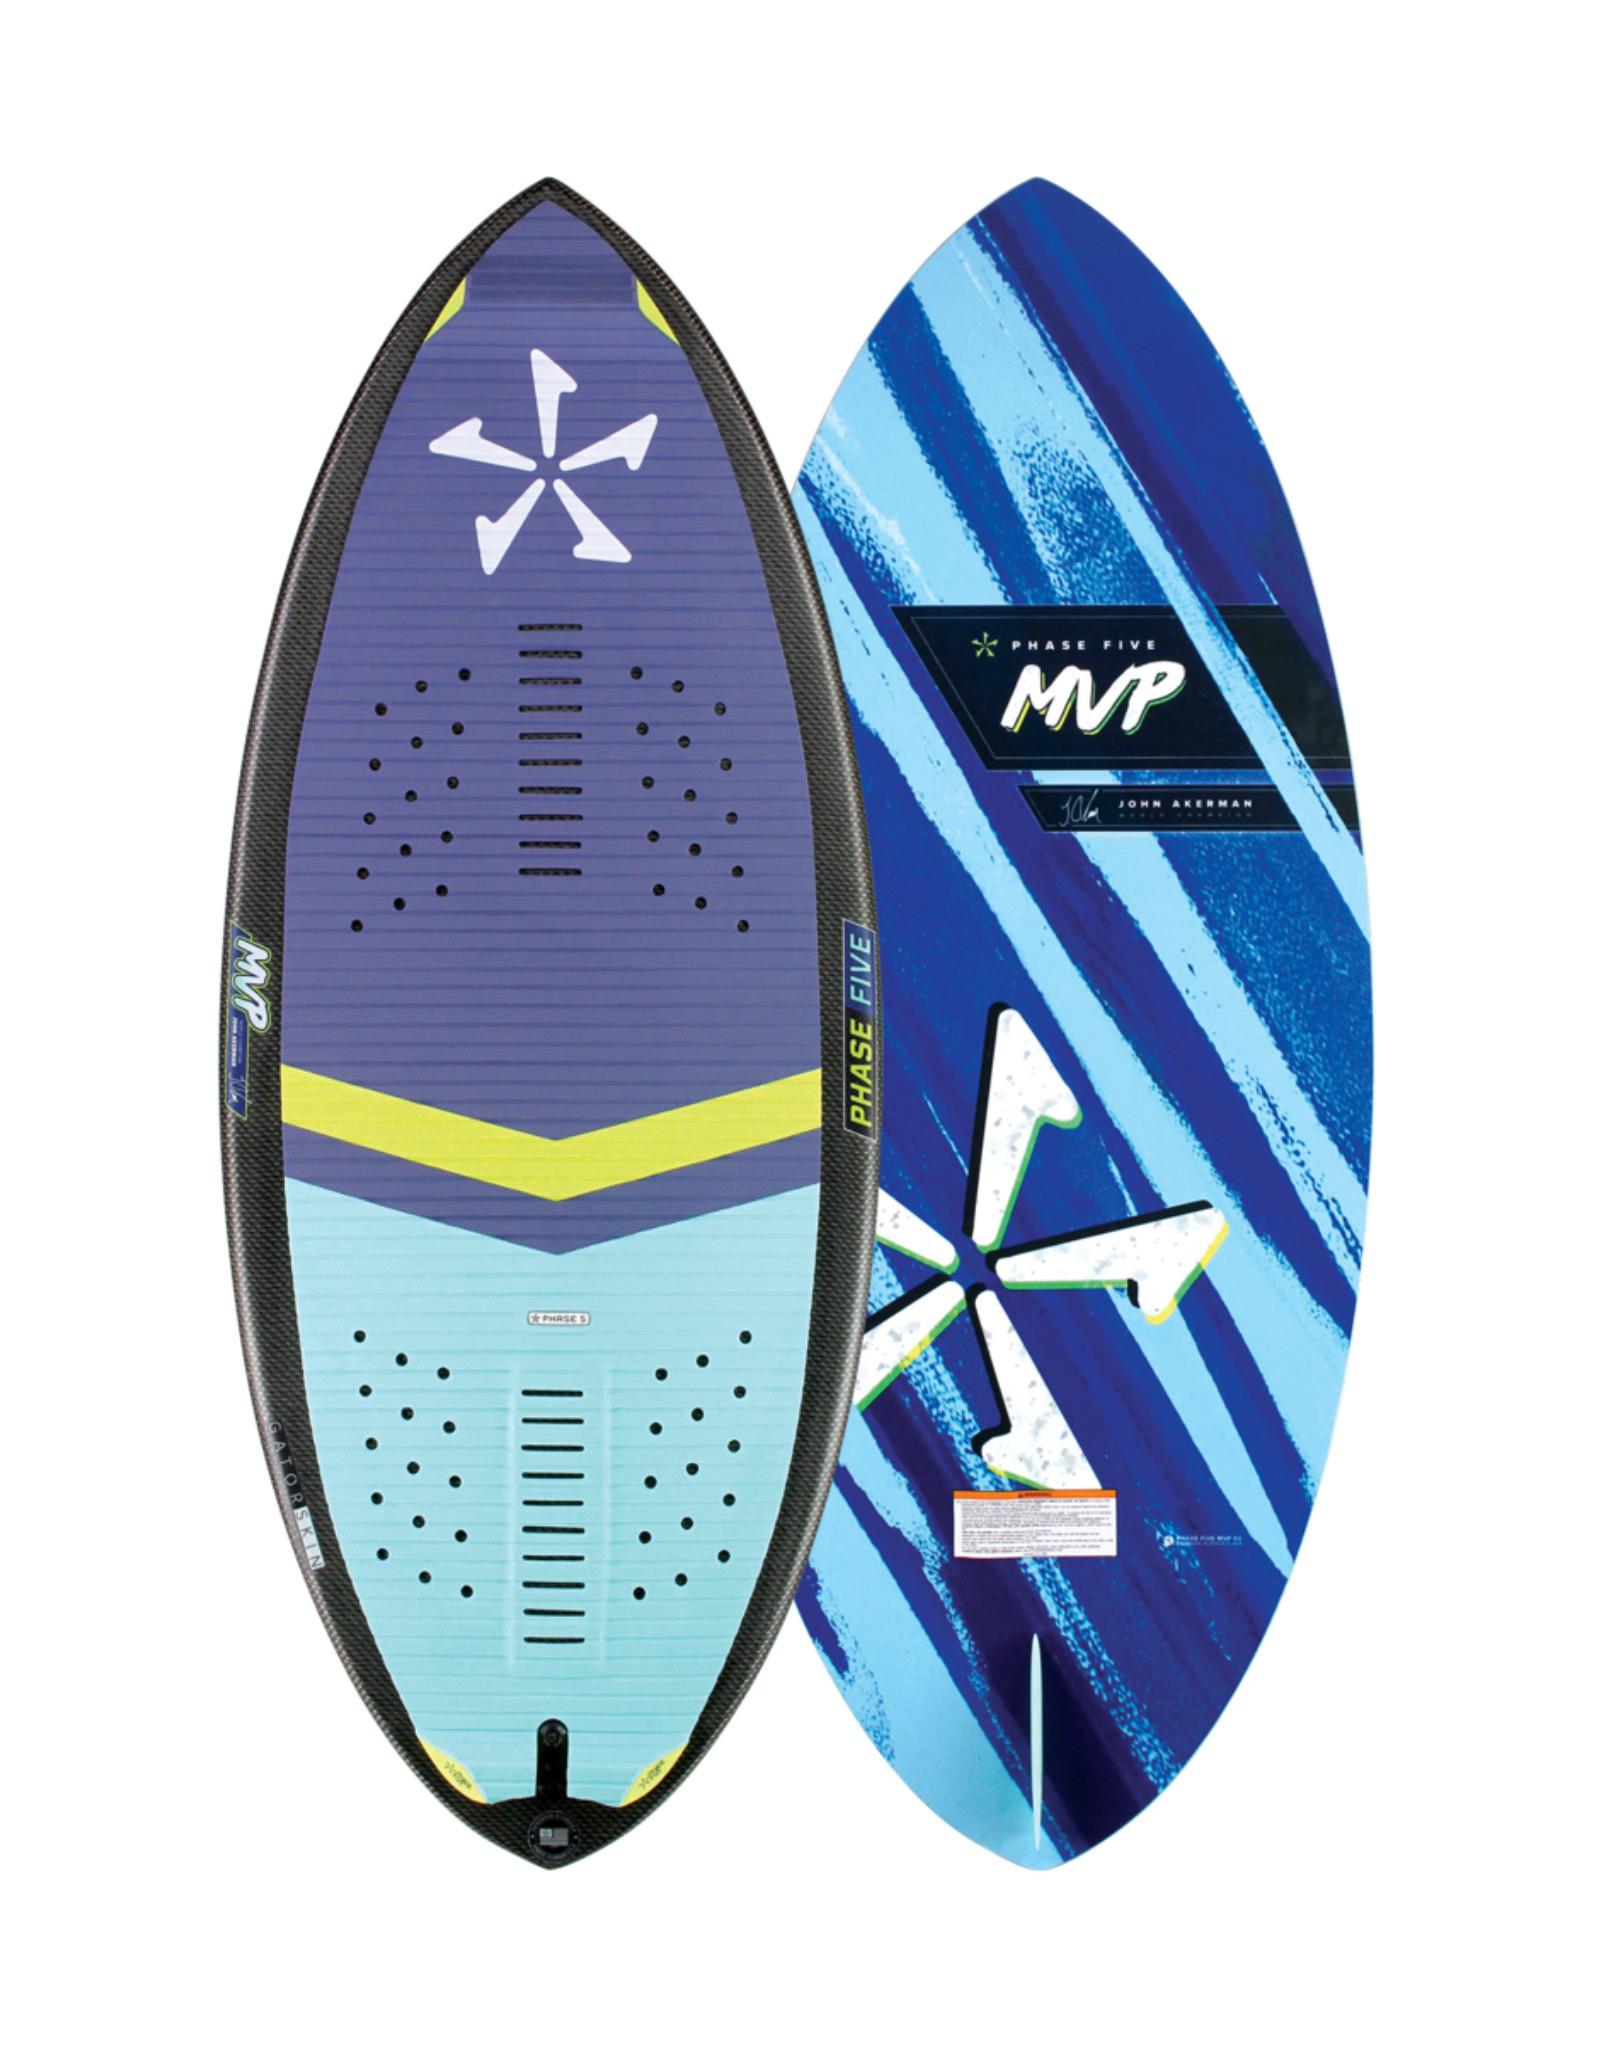 "Phase Five Phase Five MVP 56"" Skim Style Wakesurf"